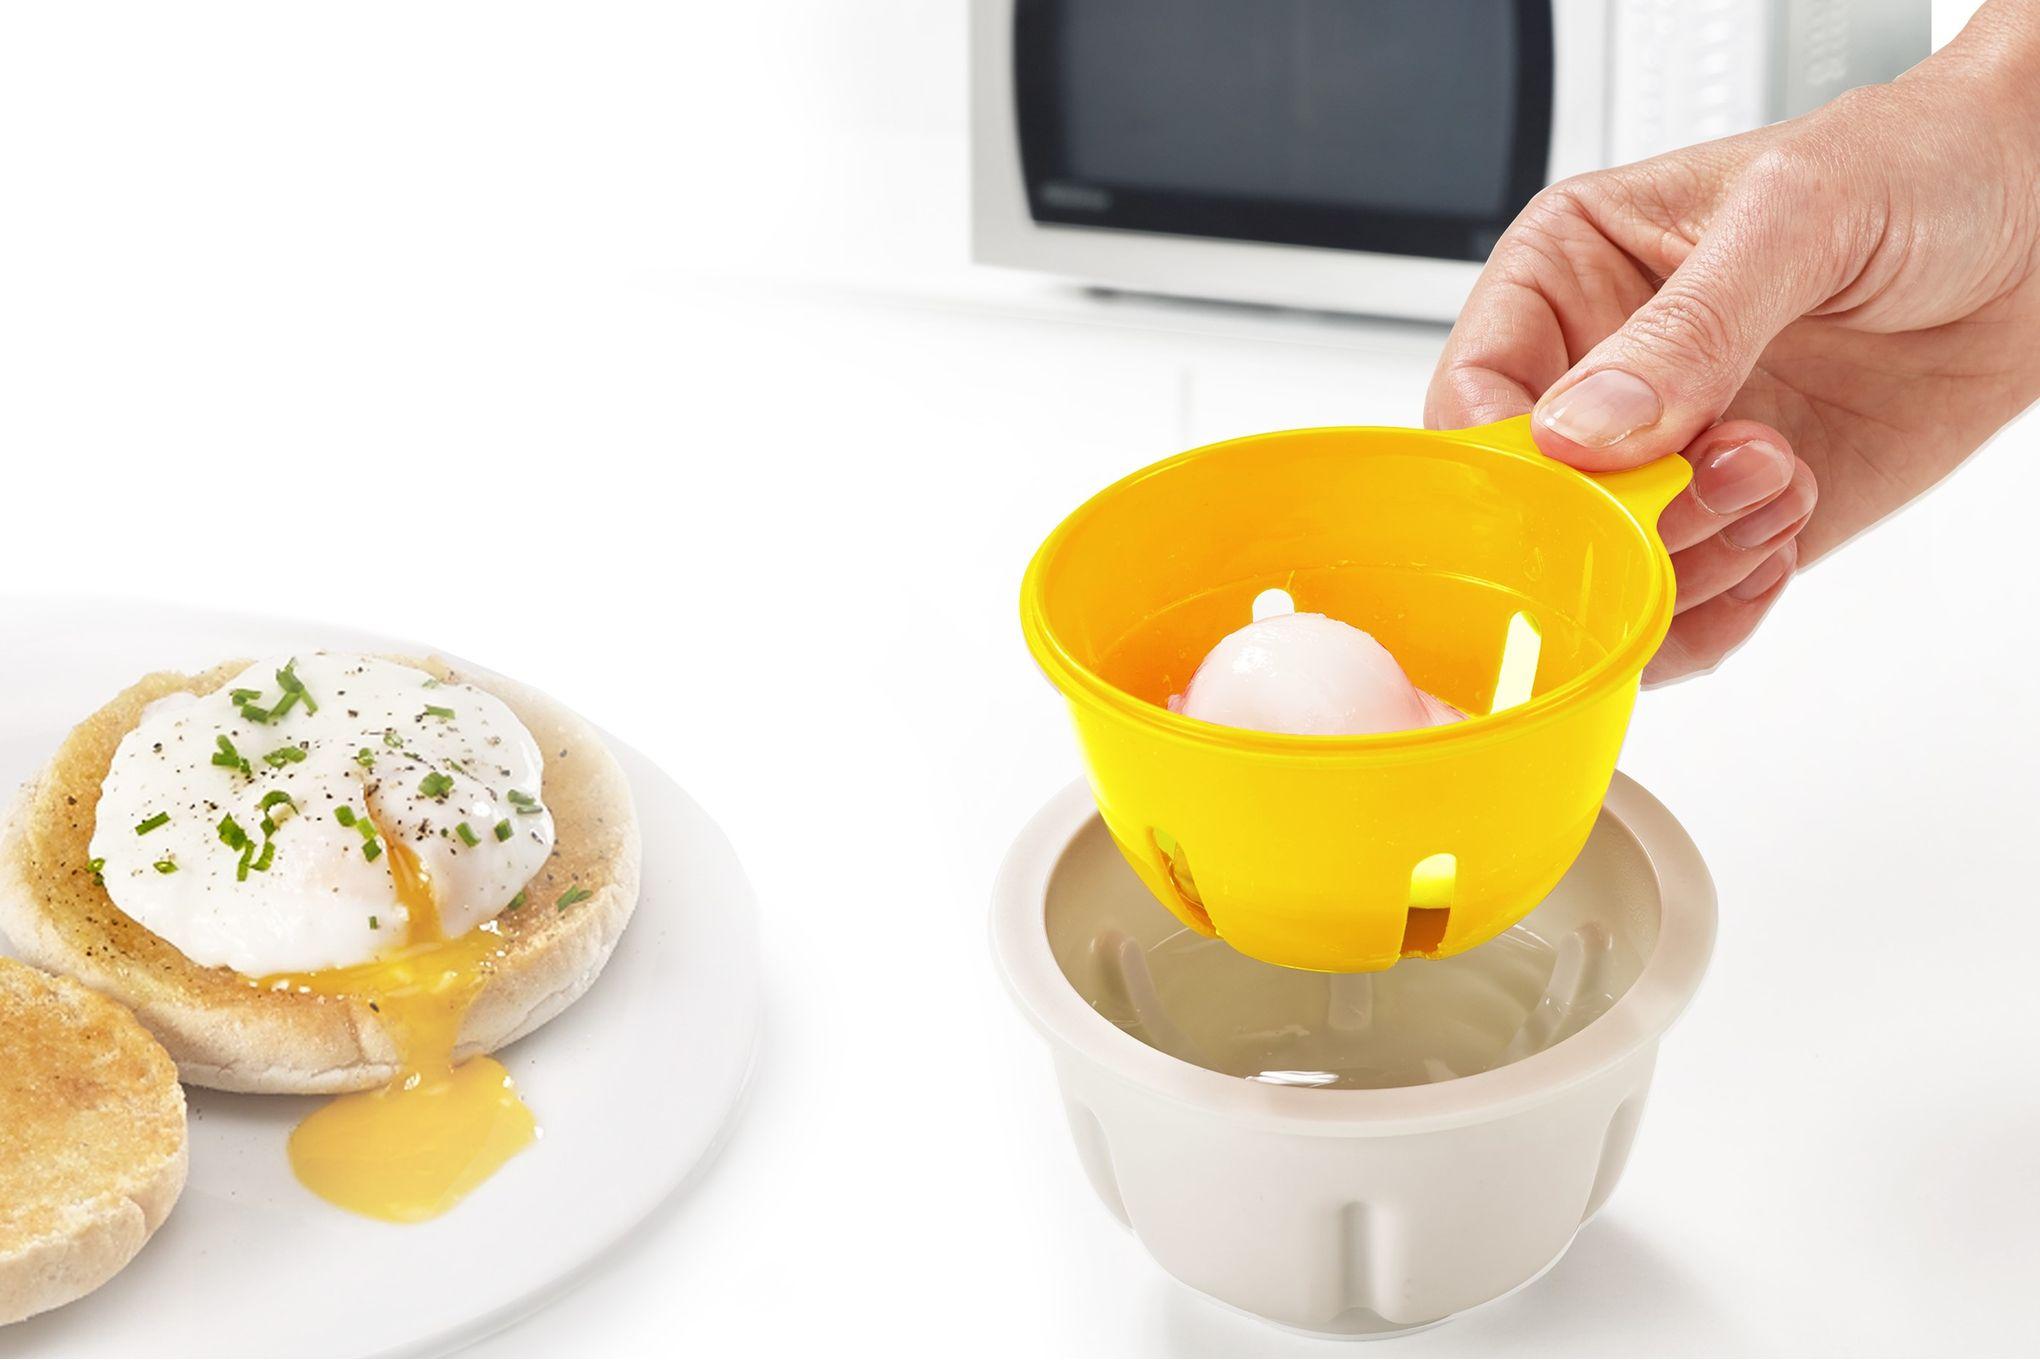 Joseph Joseph Cooking and Baking M-Poach thumb 4